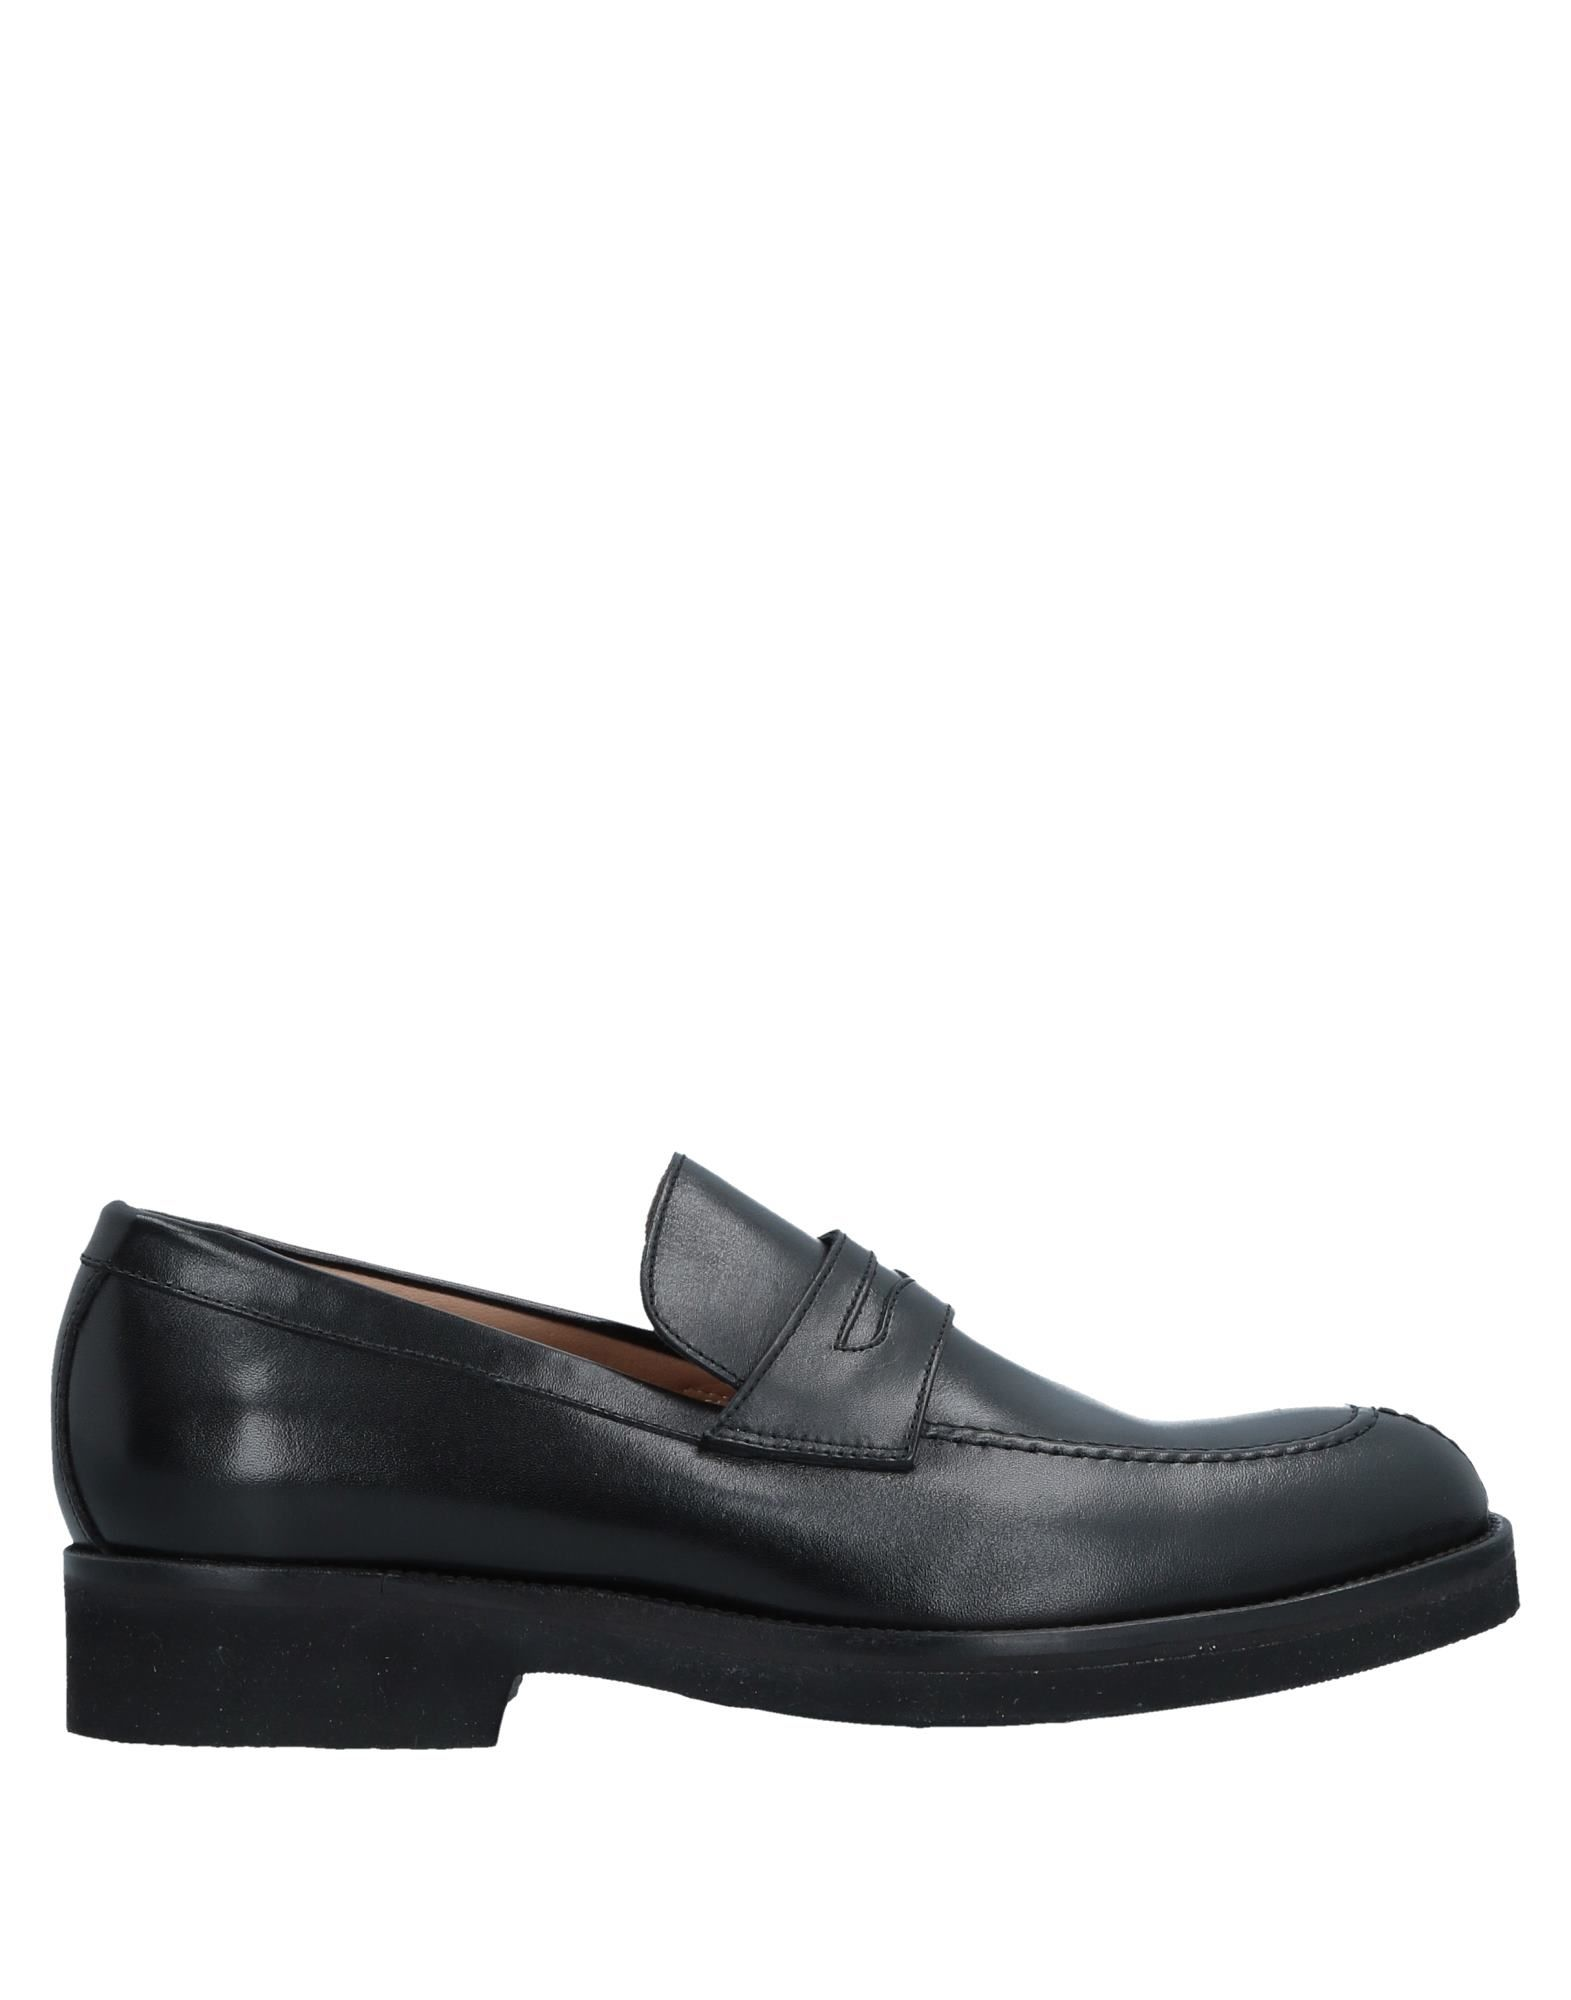 Rabatt Schuhe Settantatre Lr Mokassins Damen  11516185EB